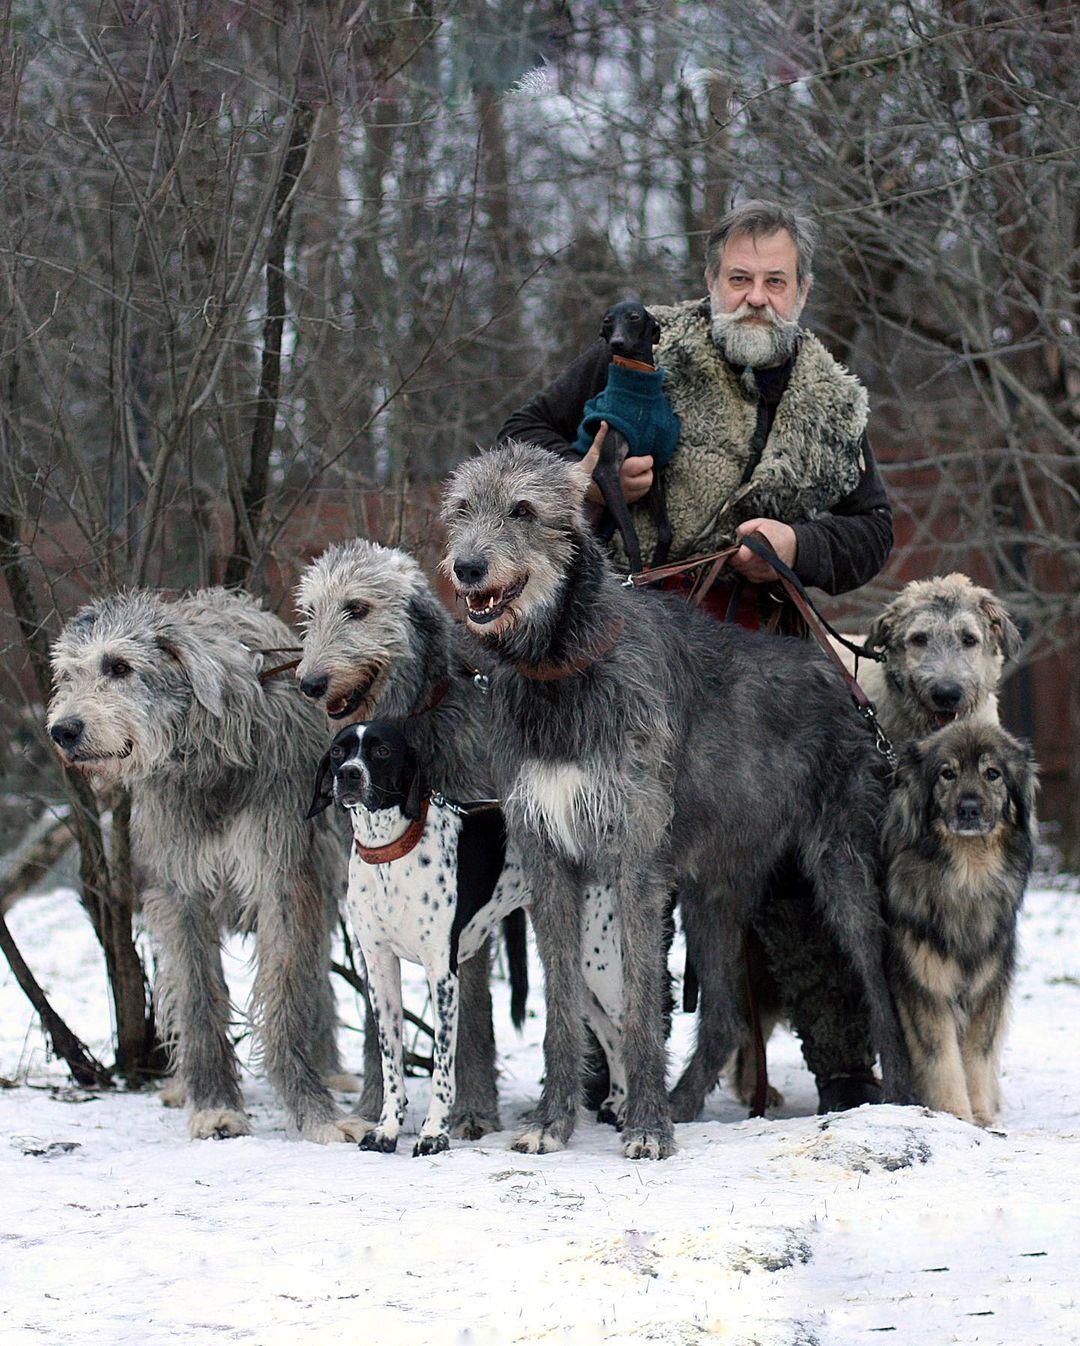 16 Irish Wolfhound Pics That'll Keep You Smiling 8